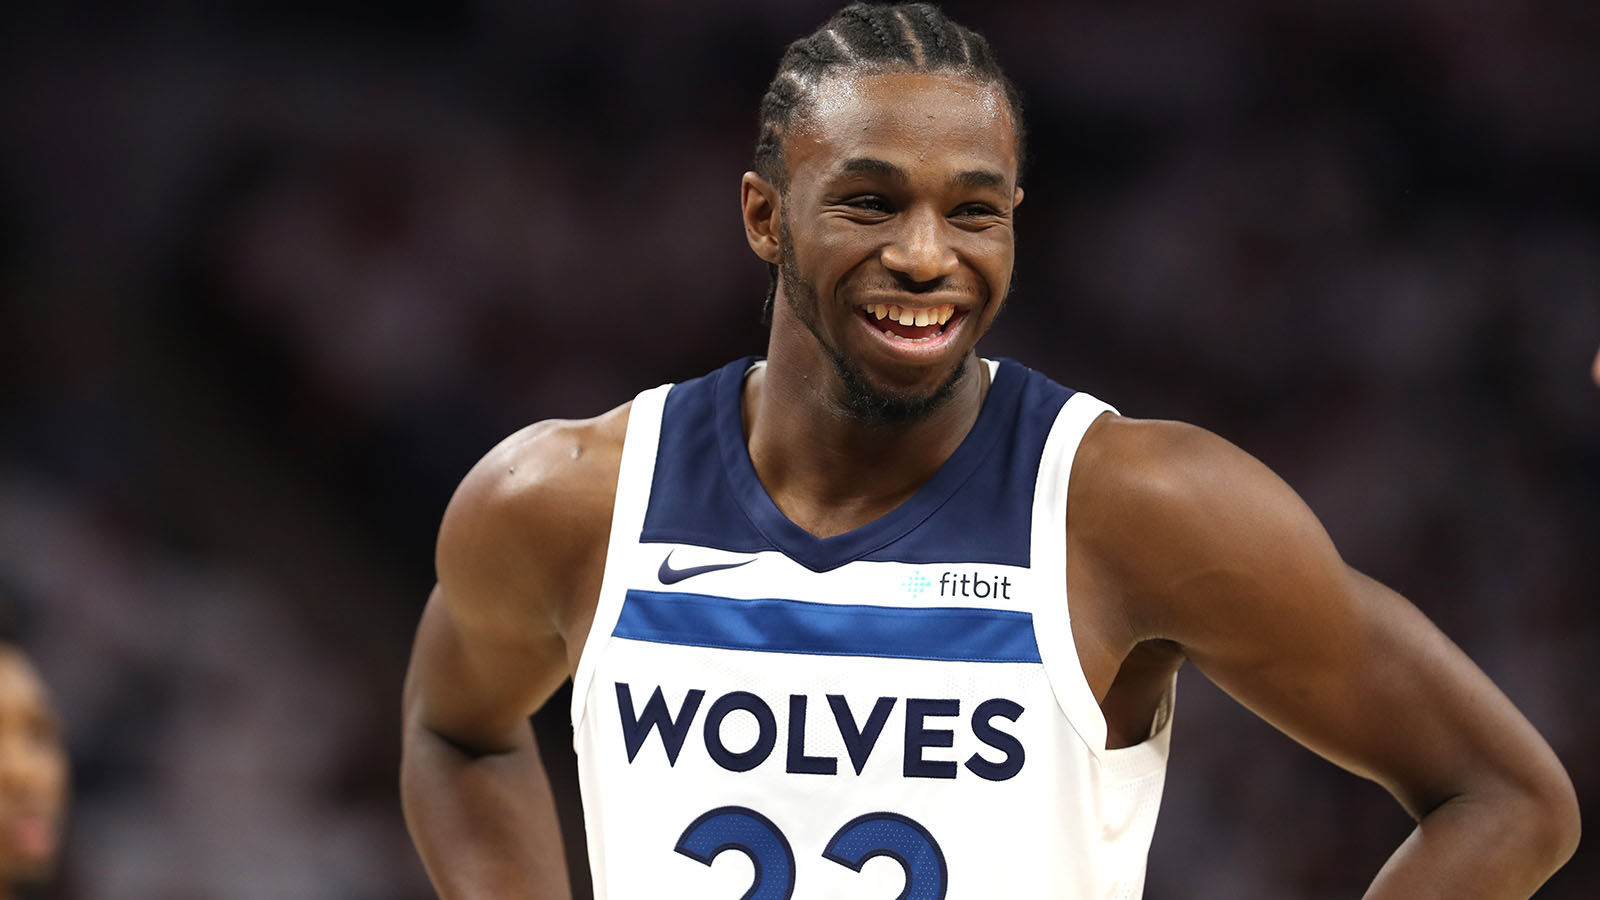 Wolves Twi-lights: Wiggins beats the first-half buzzer